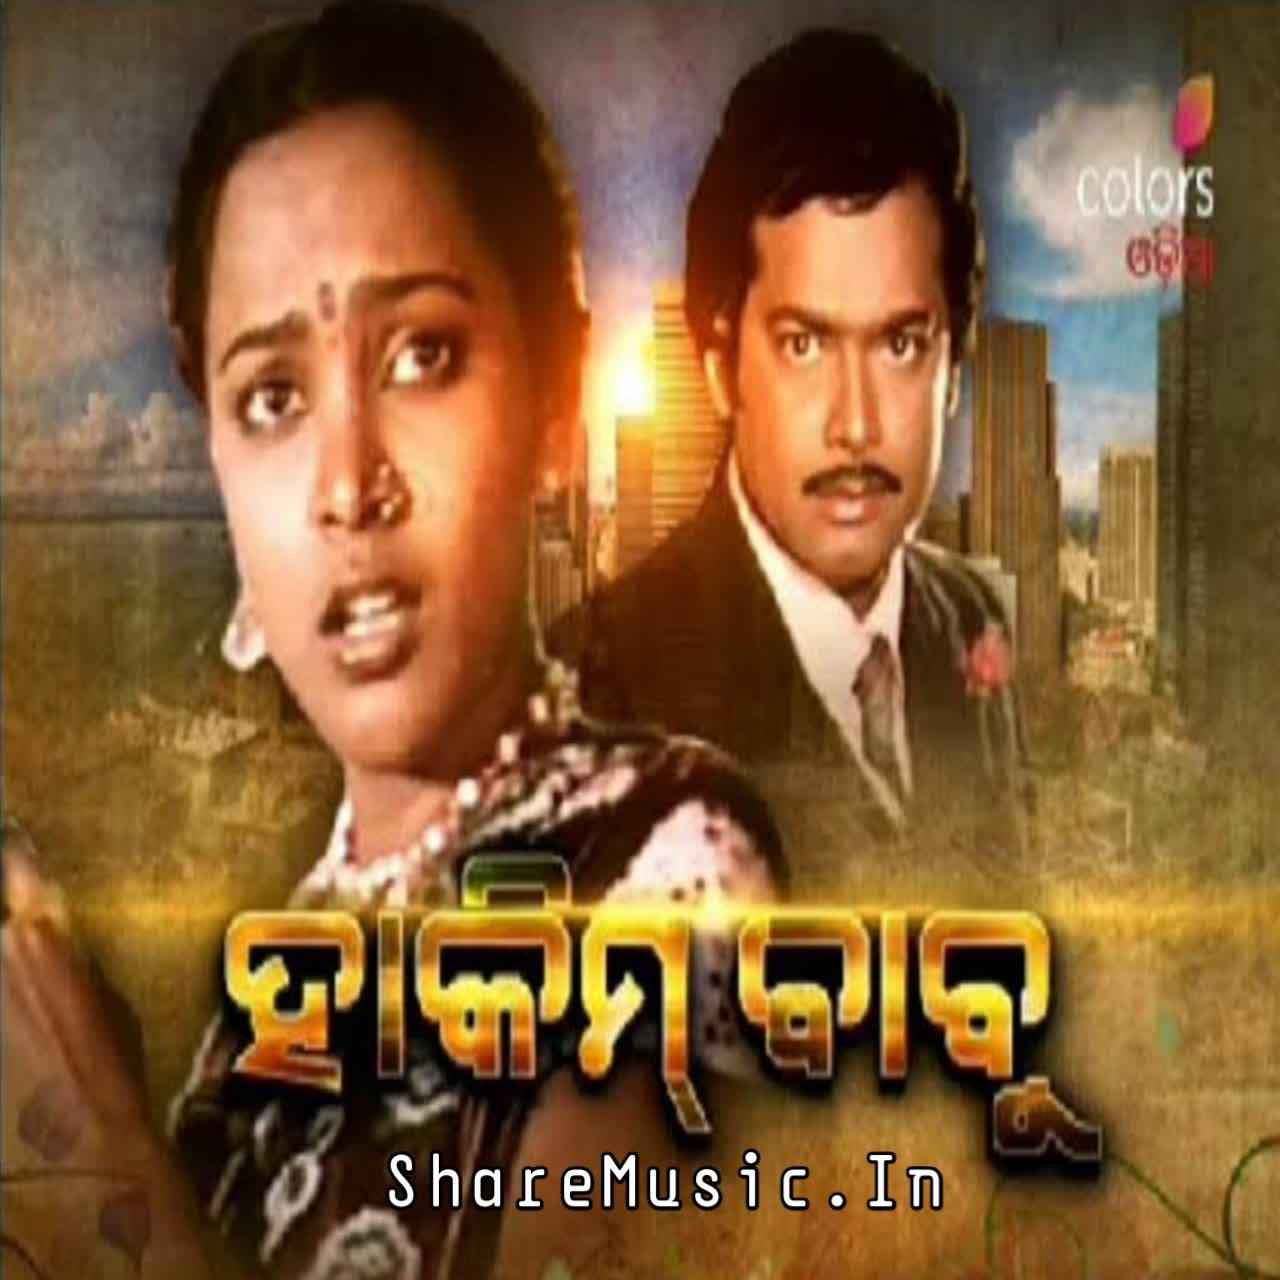 Hakim Babu - Odia Movie Title Song